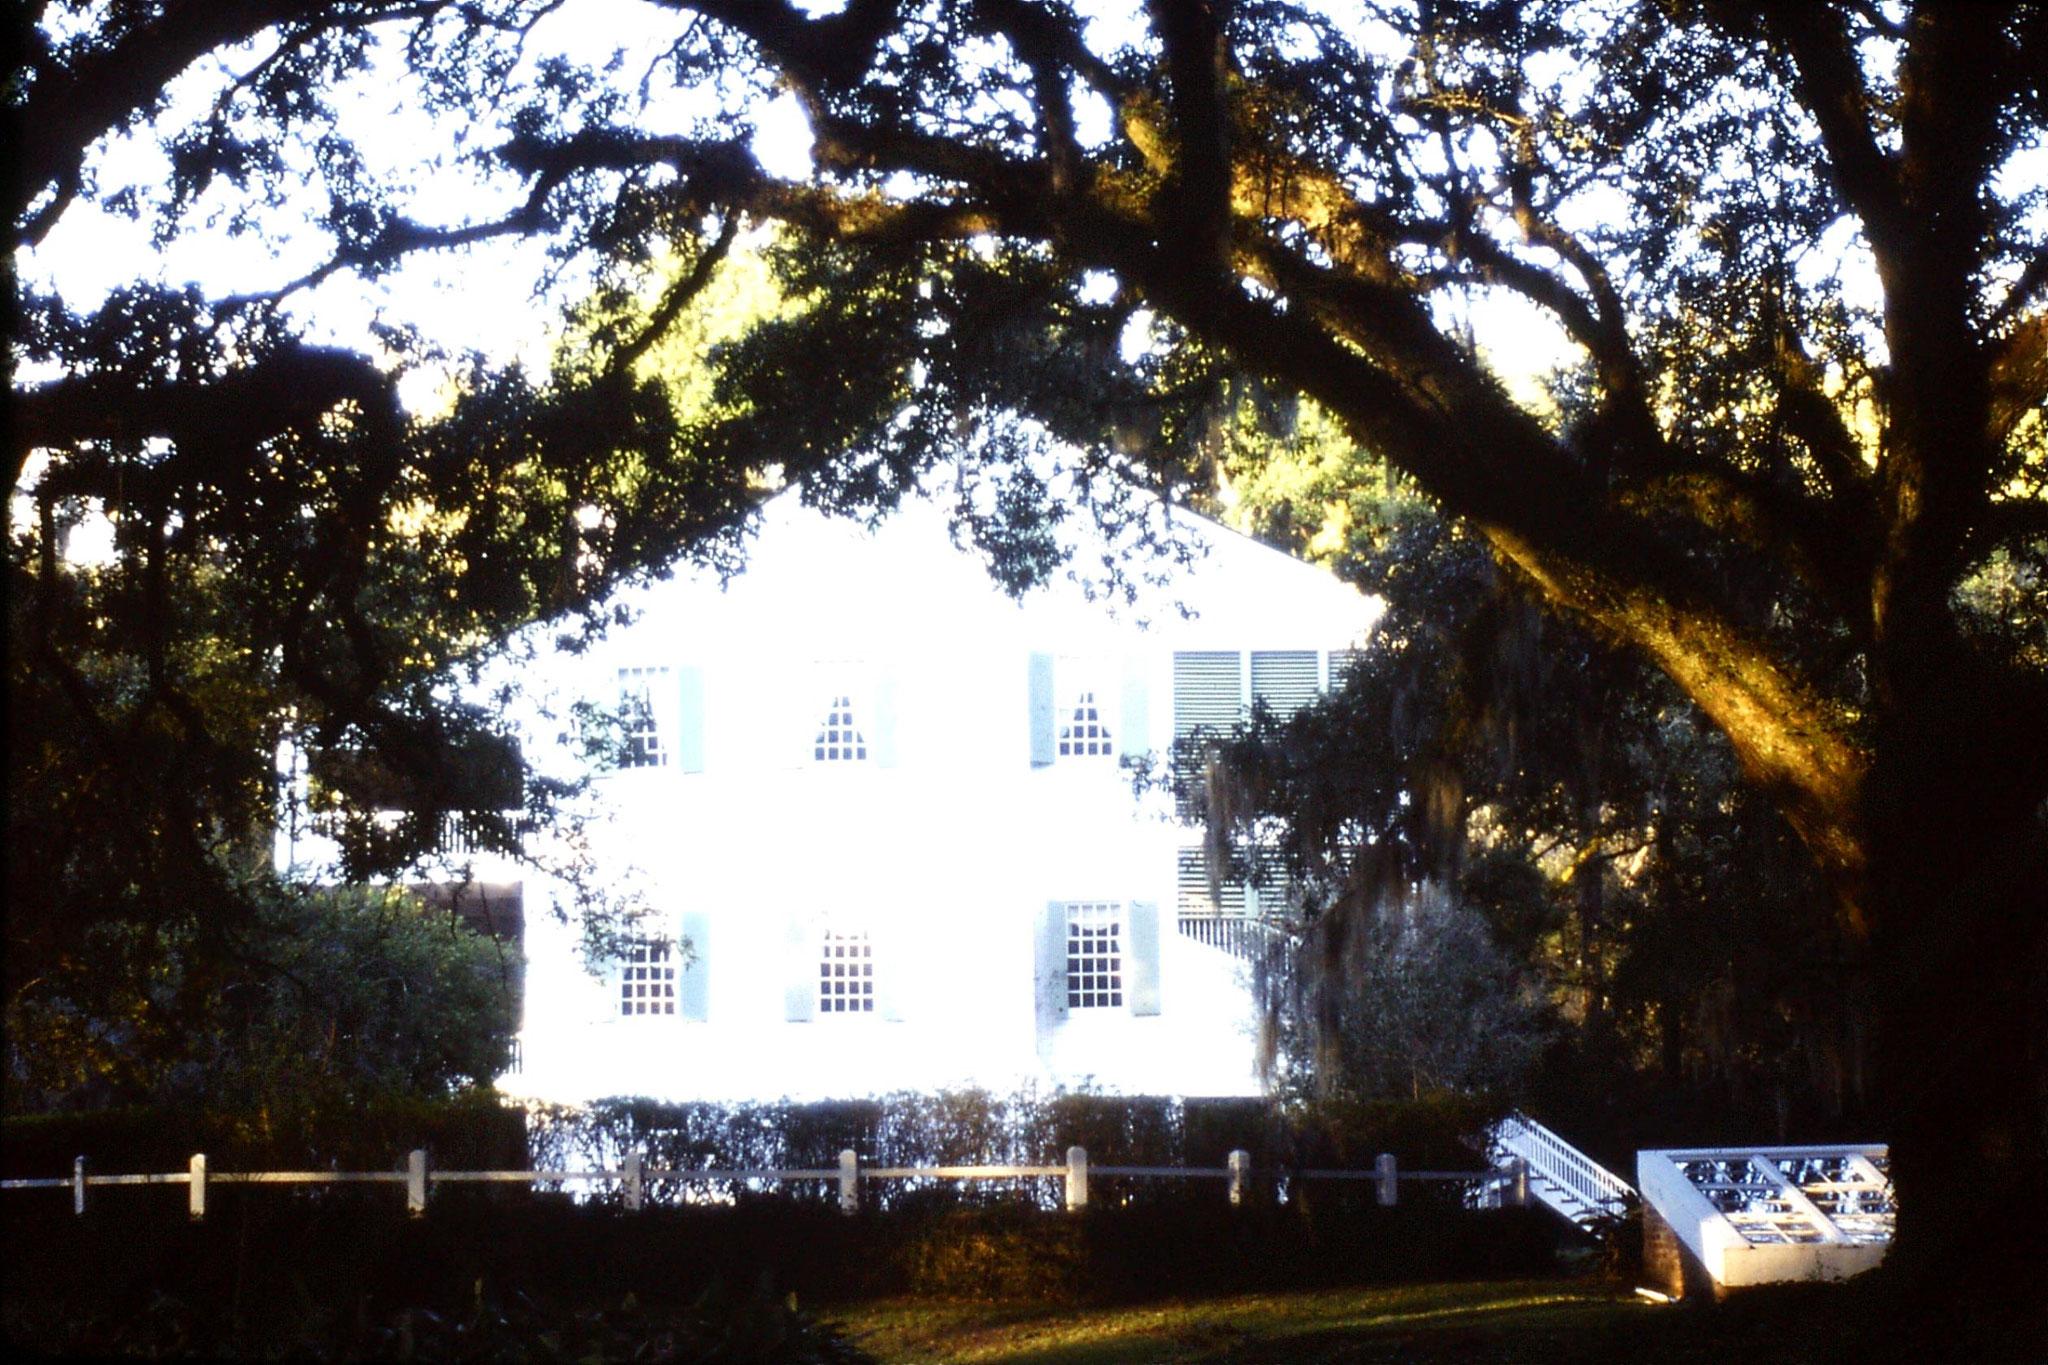 14/1/1991: 1: Audubon House